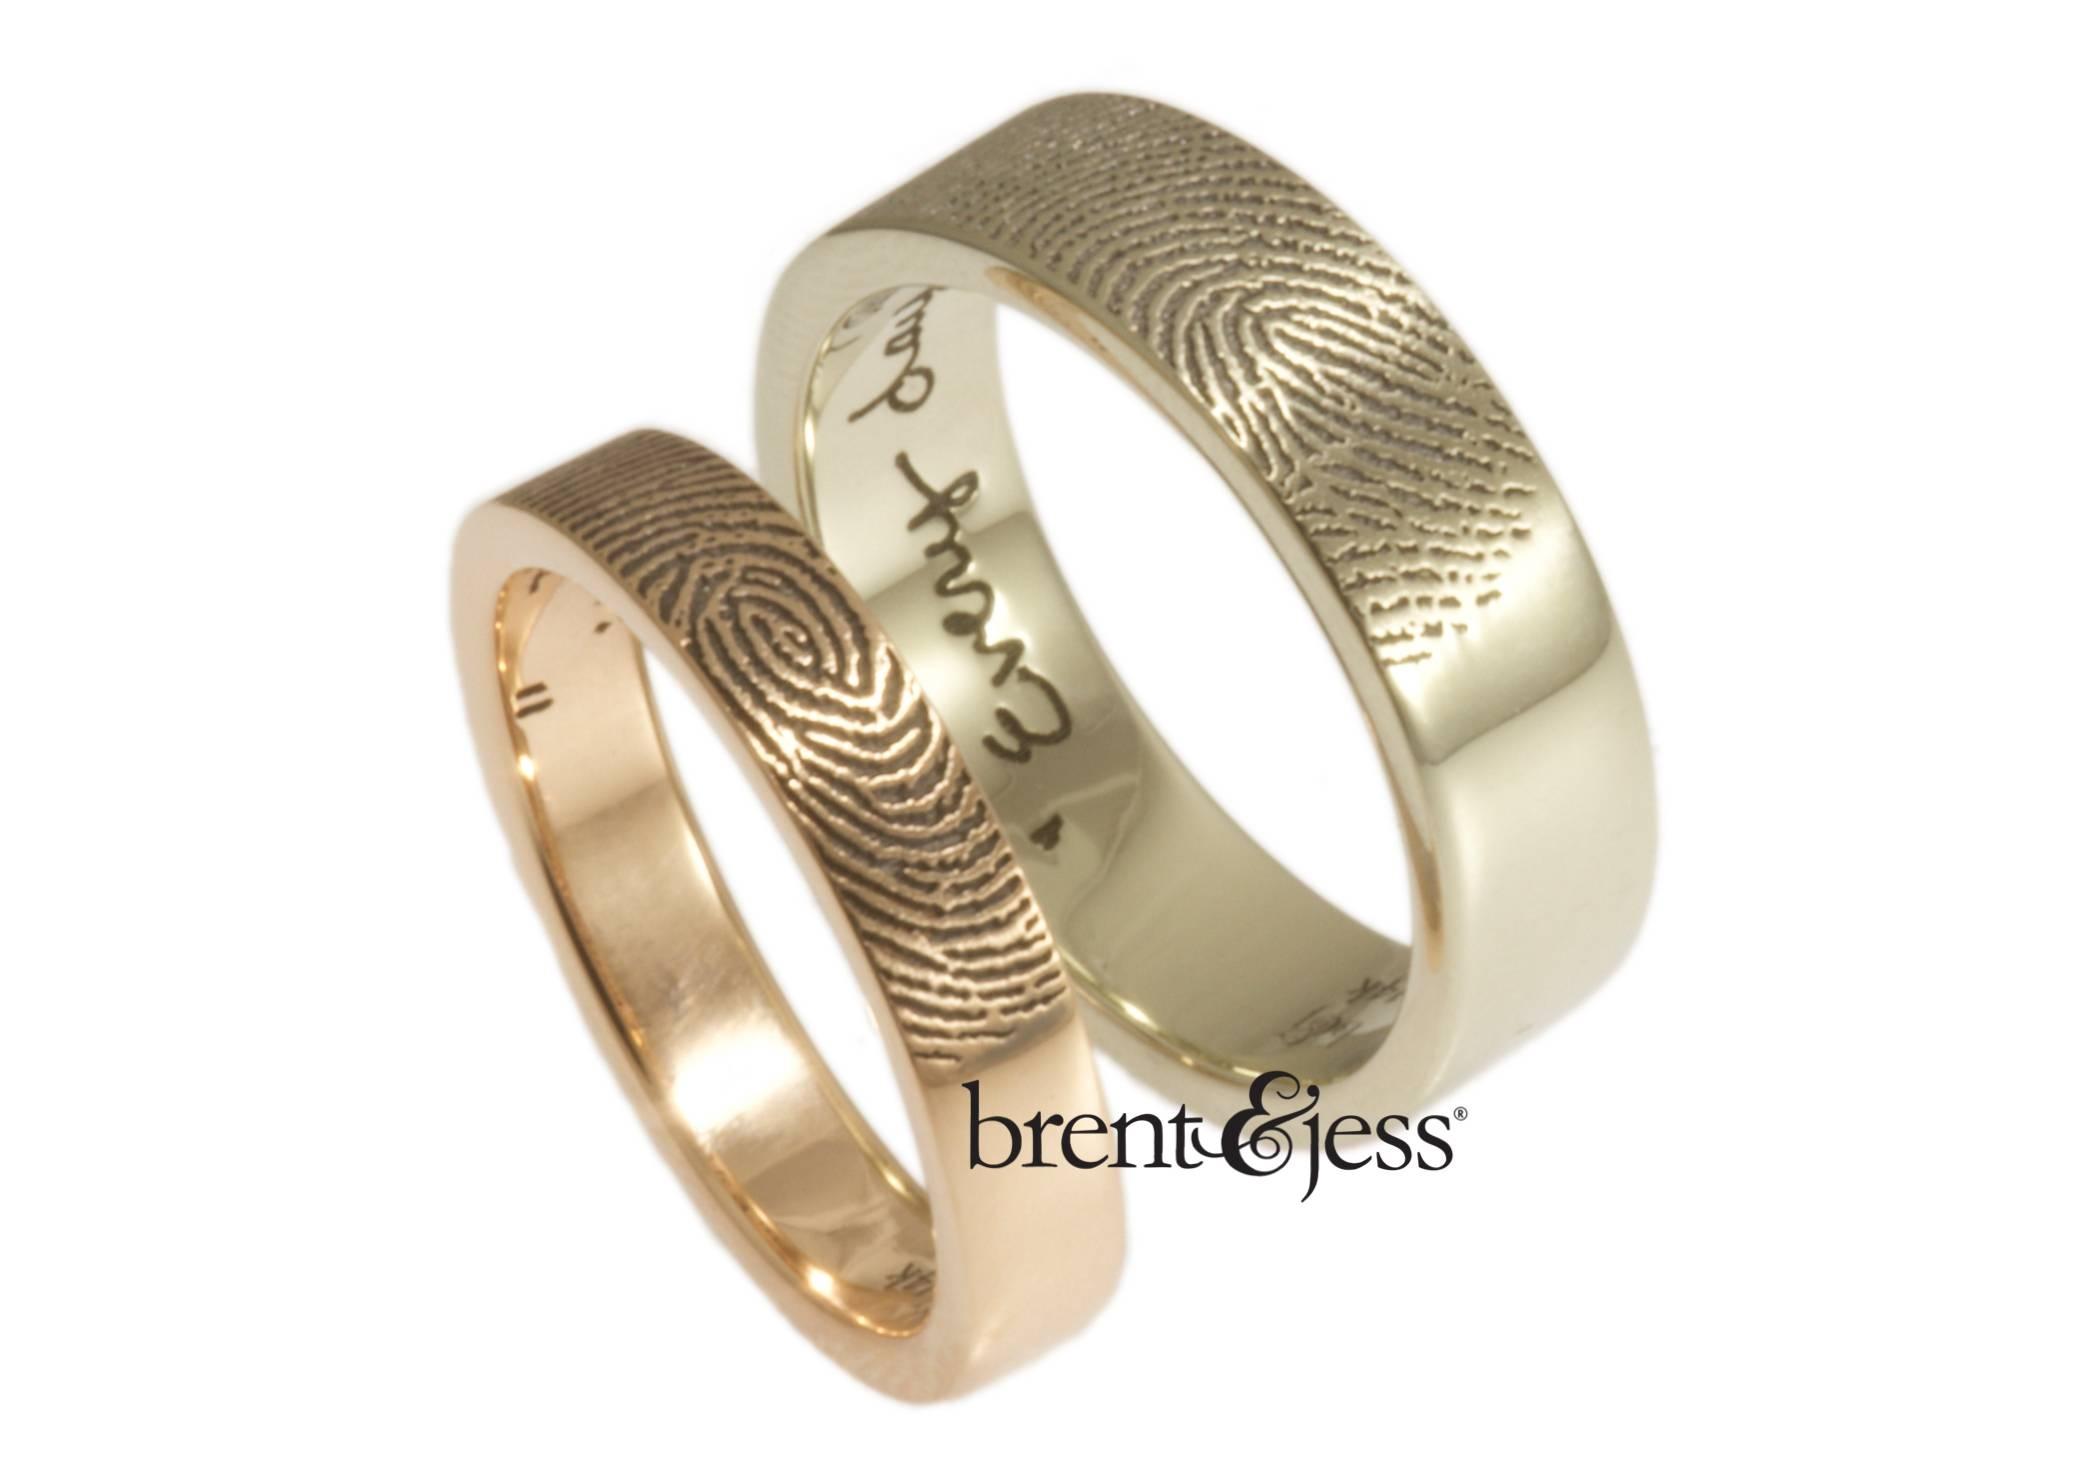 Brent&jess Fingerprint Wedding Rings · Ruffled With Fingerprint Wedding Bands (View 8 of 15)